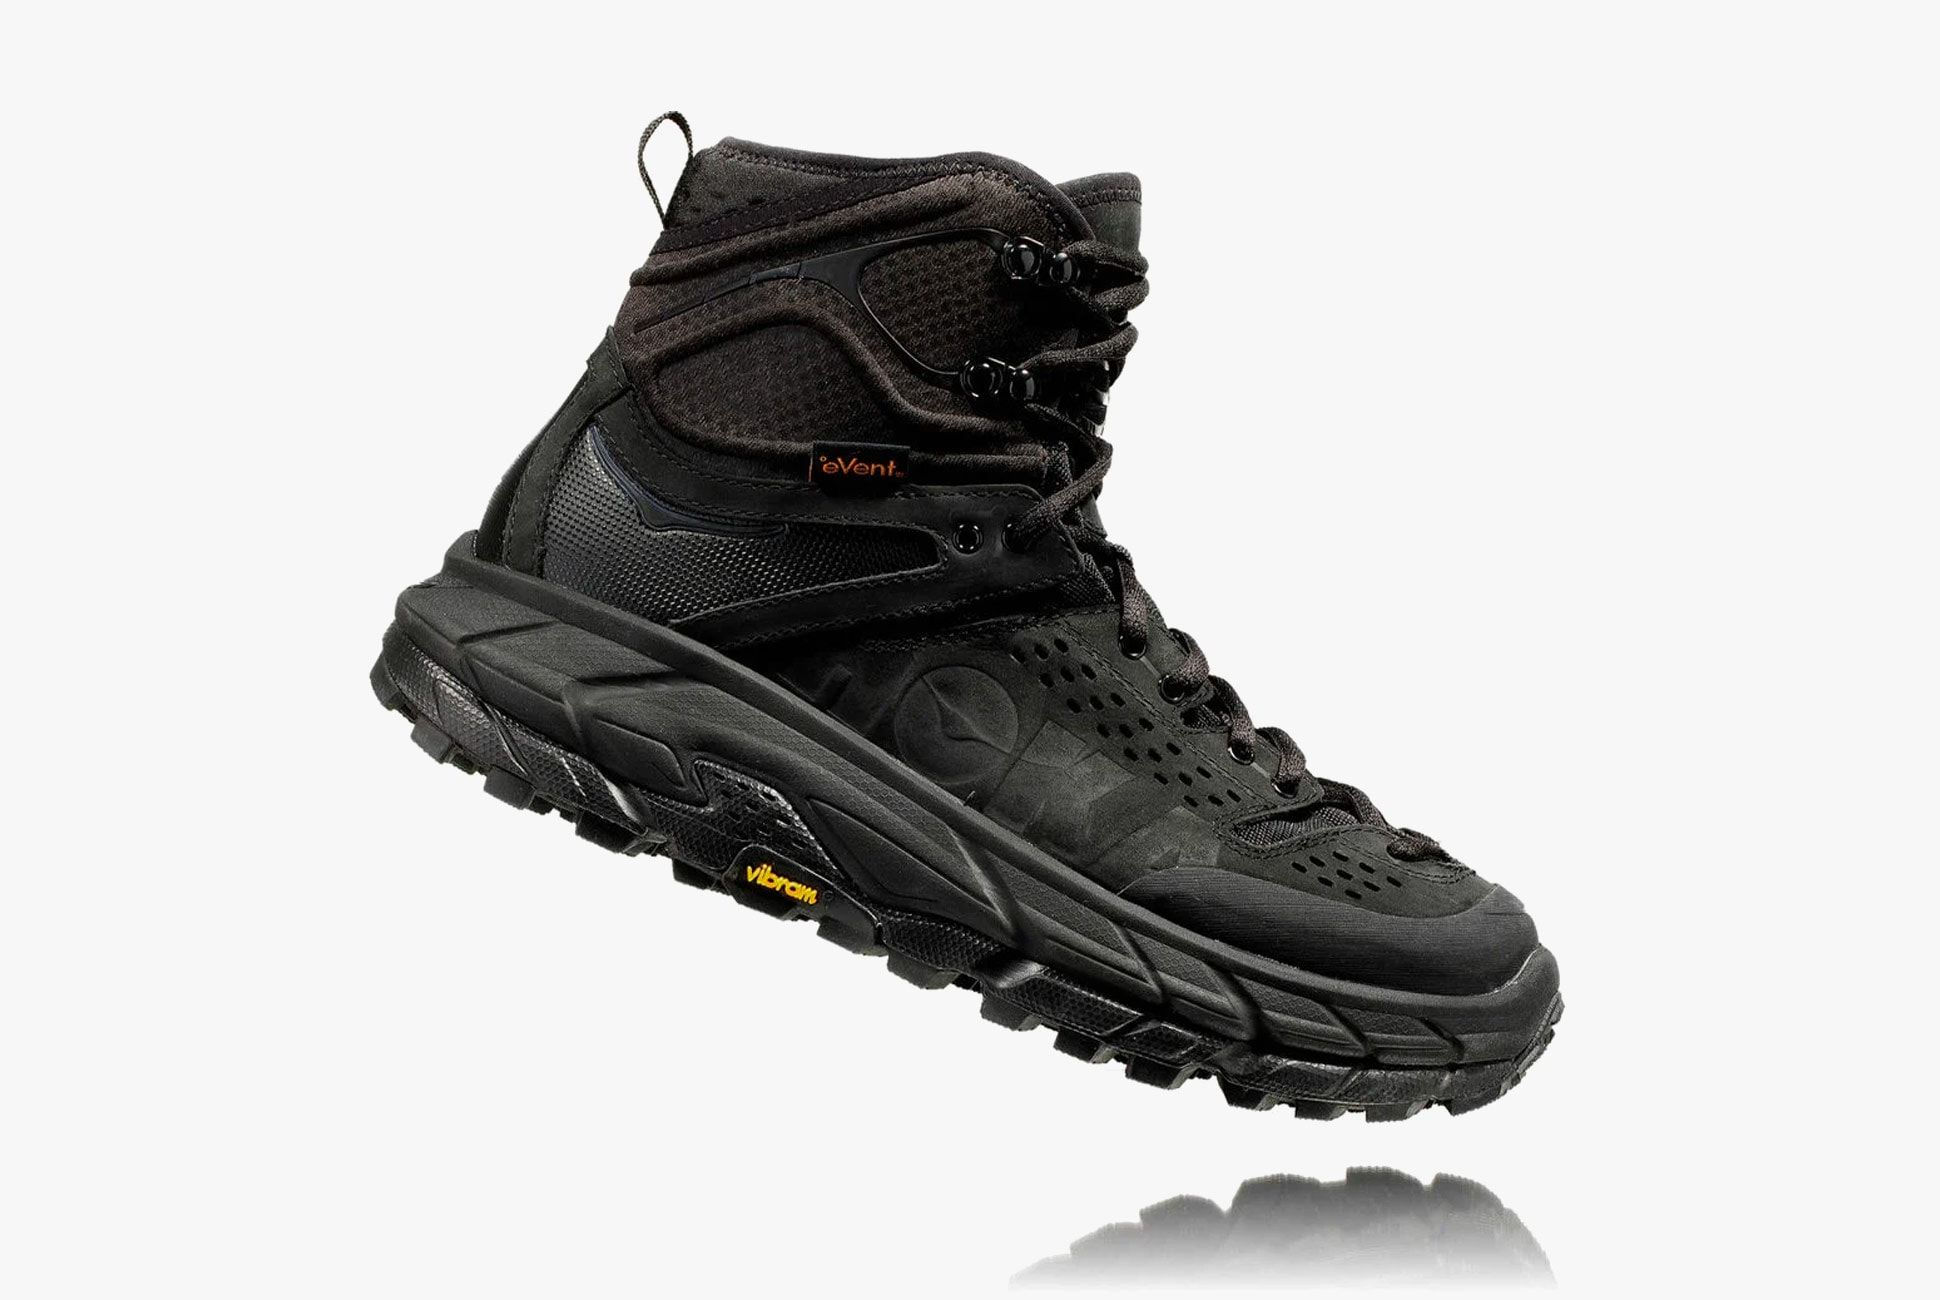 Hoka One One's Outdoor Boot is Urban